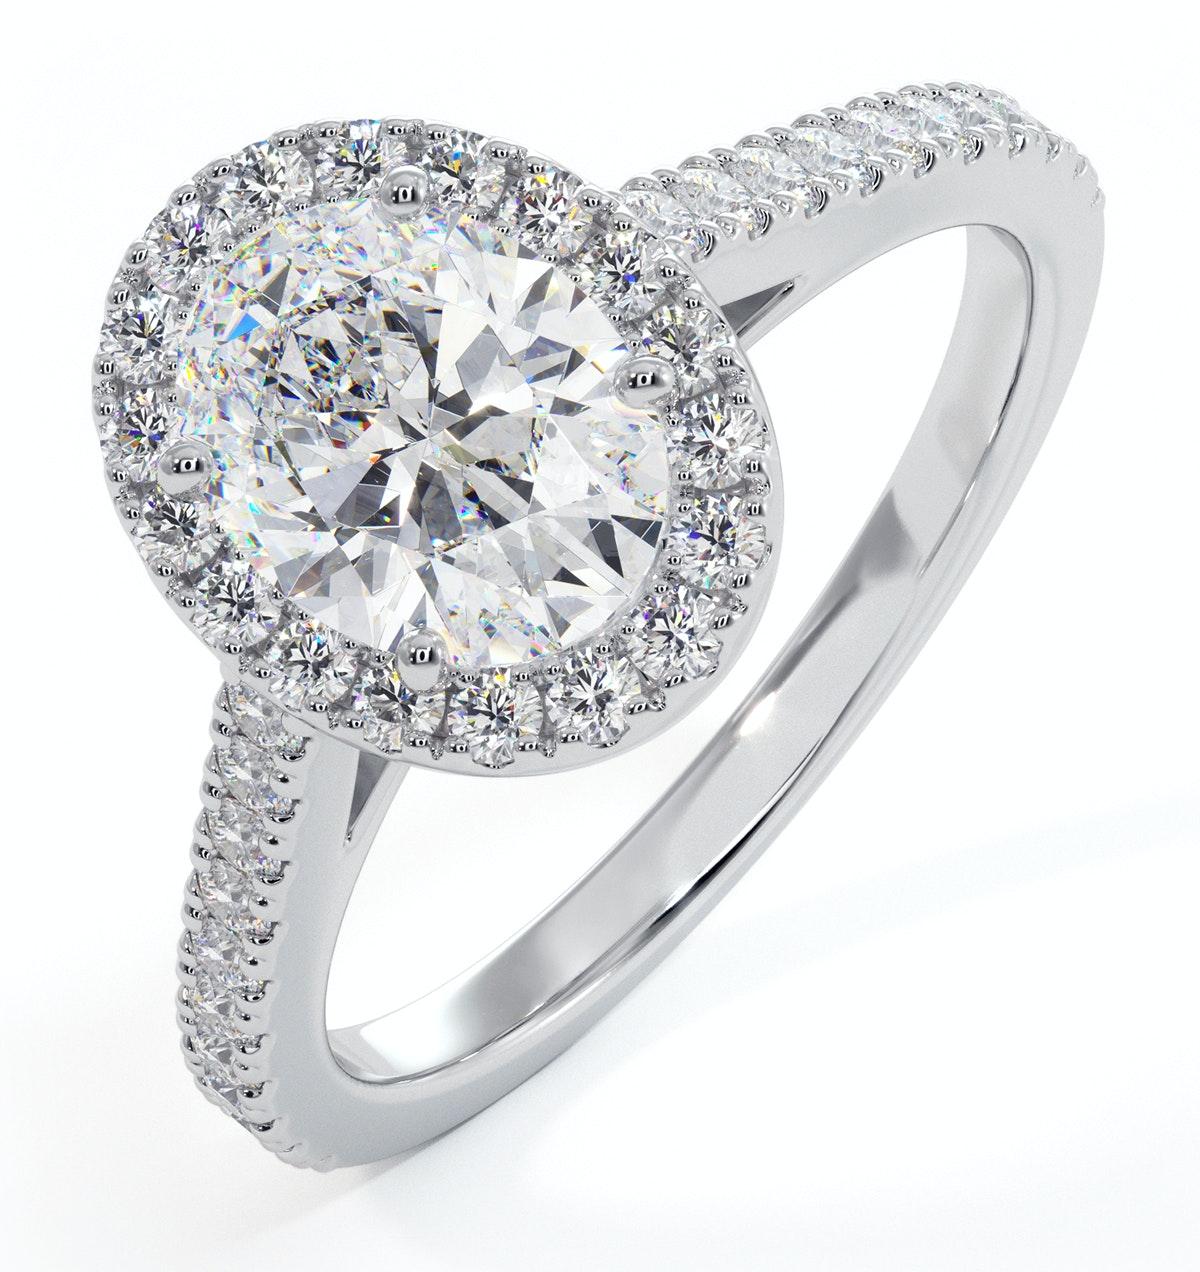 Georgina GIA Oval Diamond Halo Engagement Ring Platinum 1.55ct G/VS1